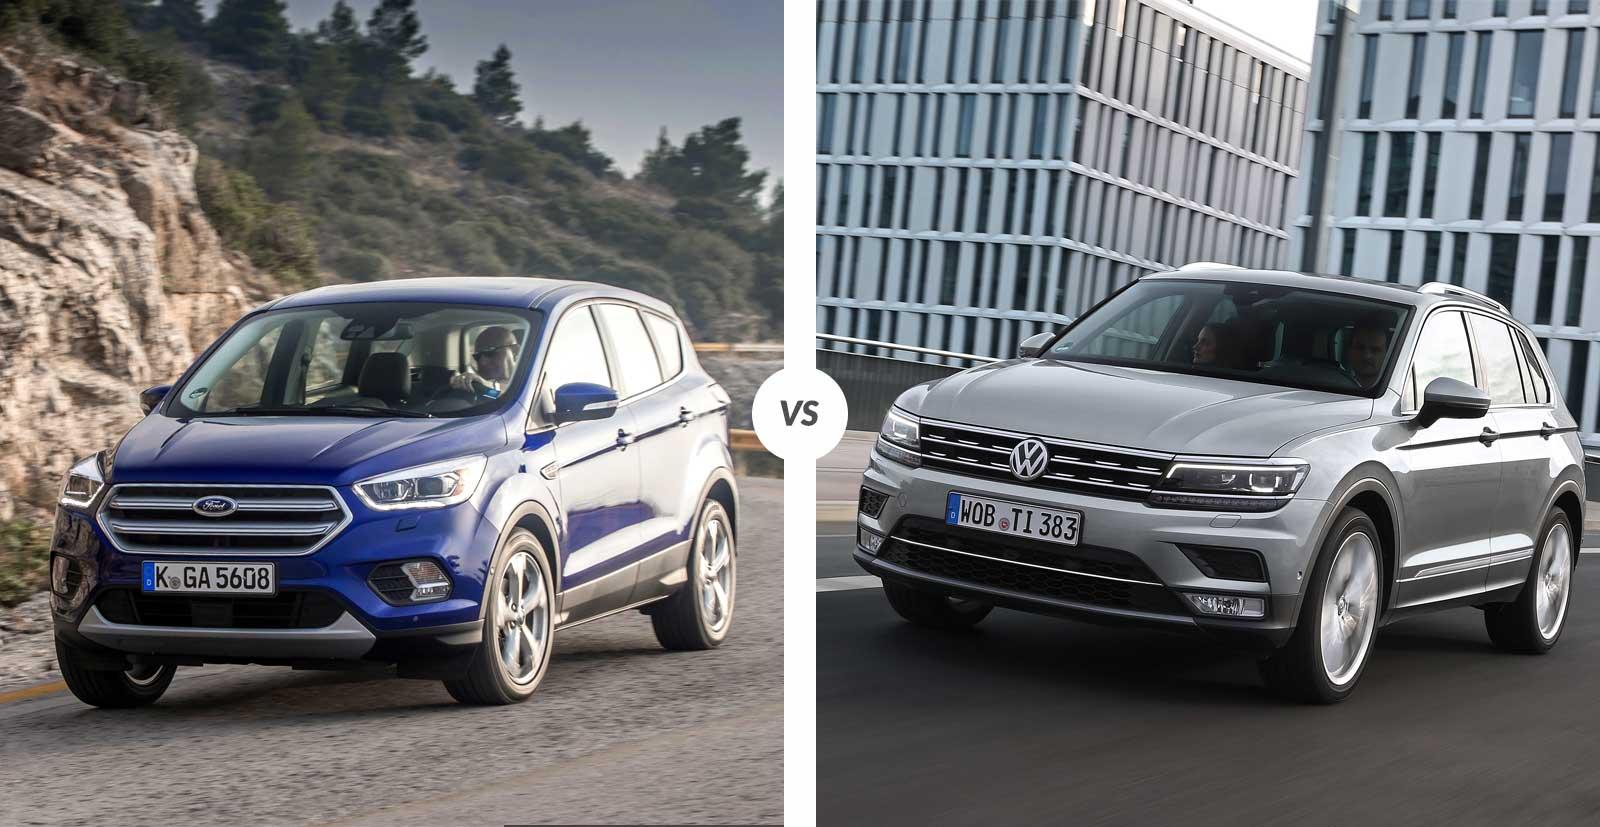 Comparaison : Ford Kuga vs Volkswagen Tiguan